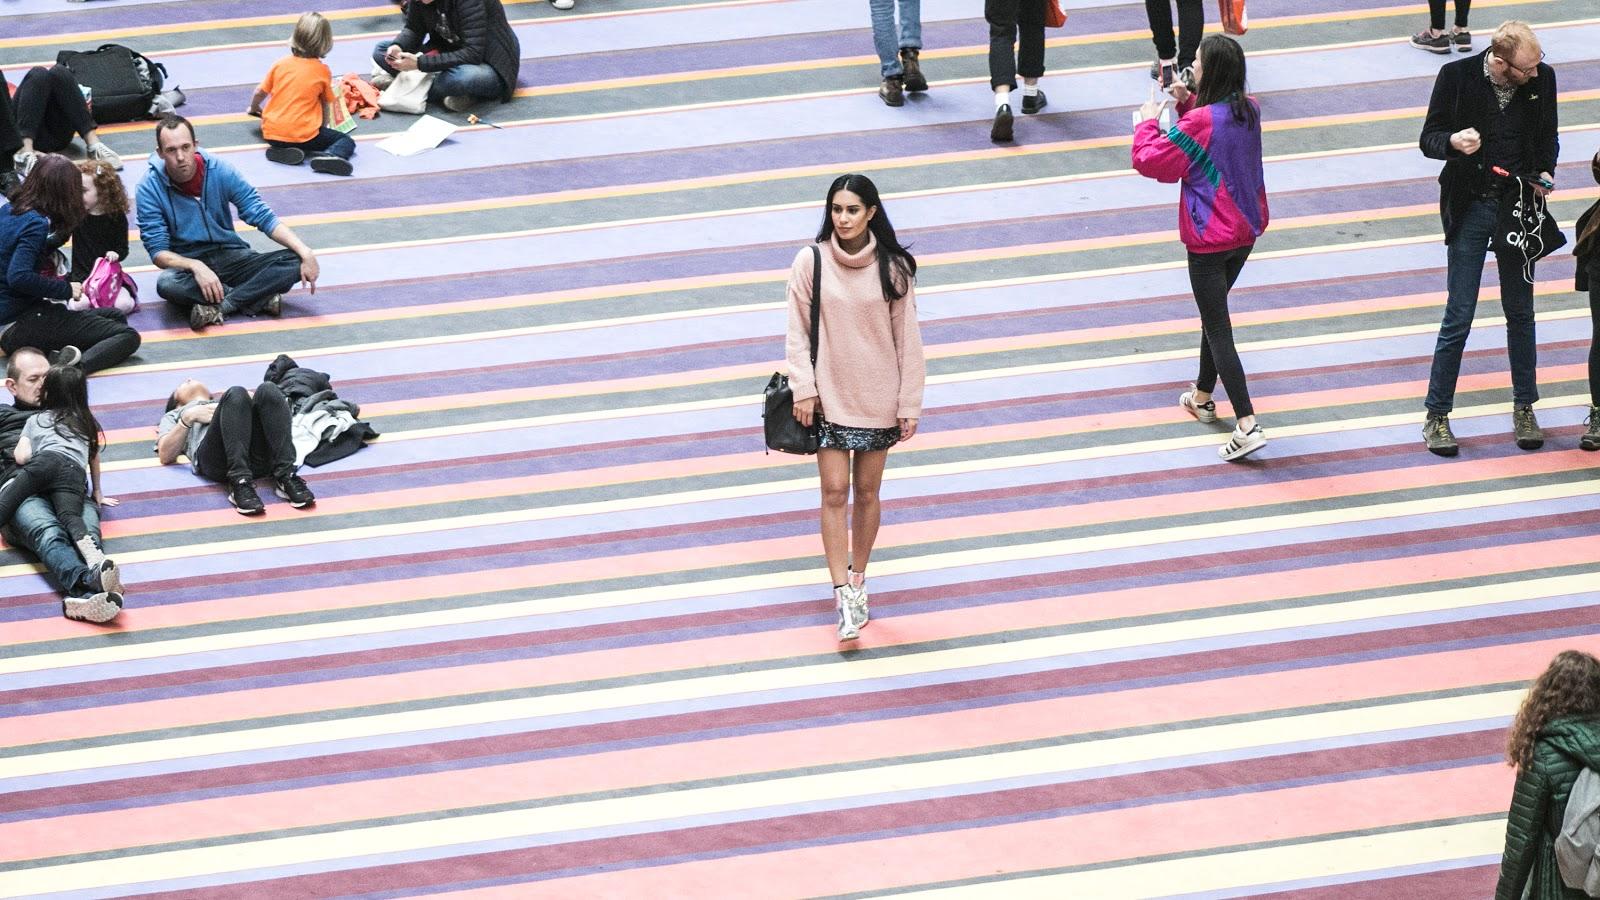 Fashion Blogger Reena Rai discusses the importance of representation for British Asian women